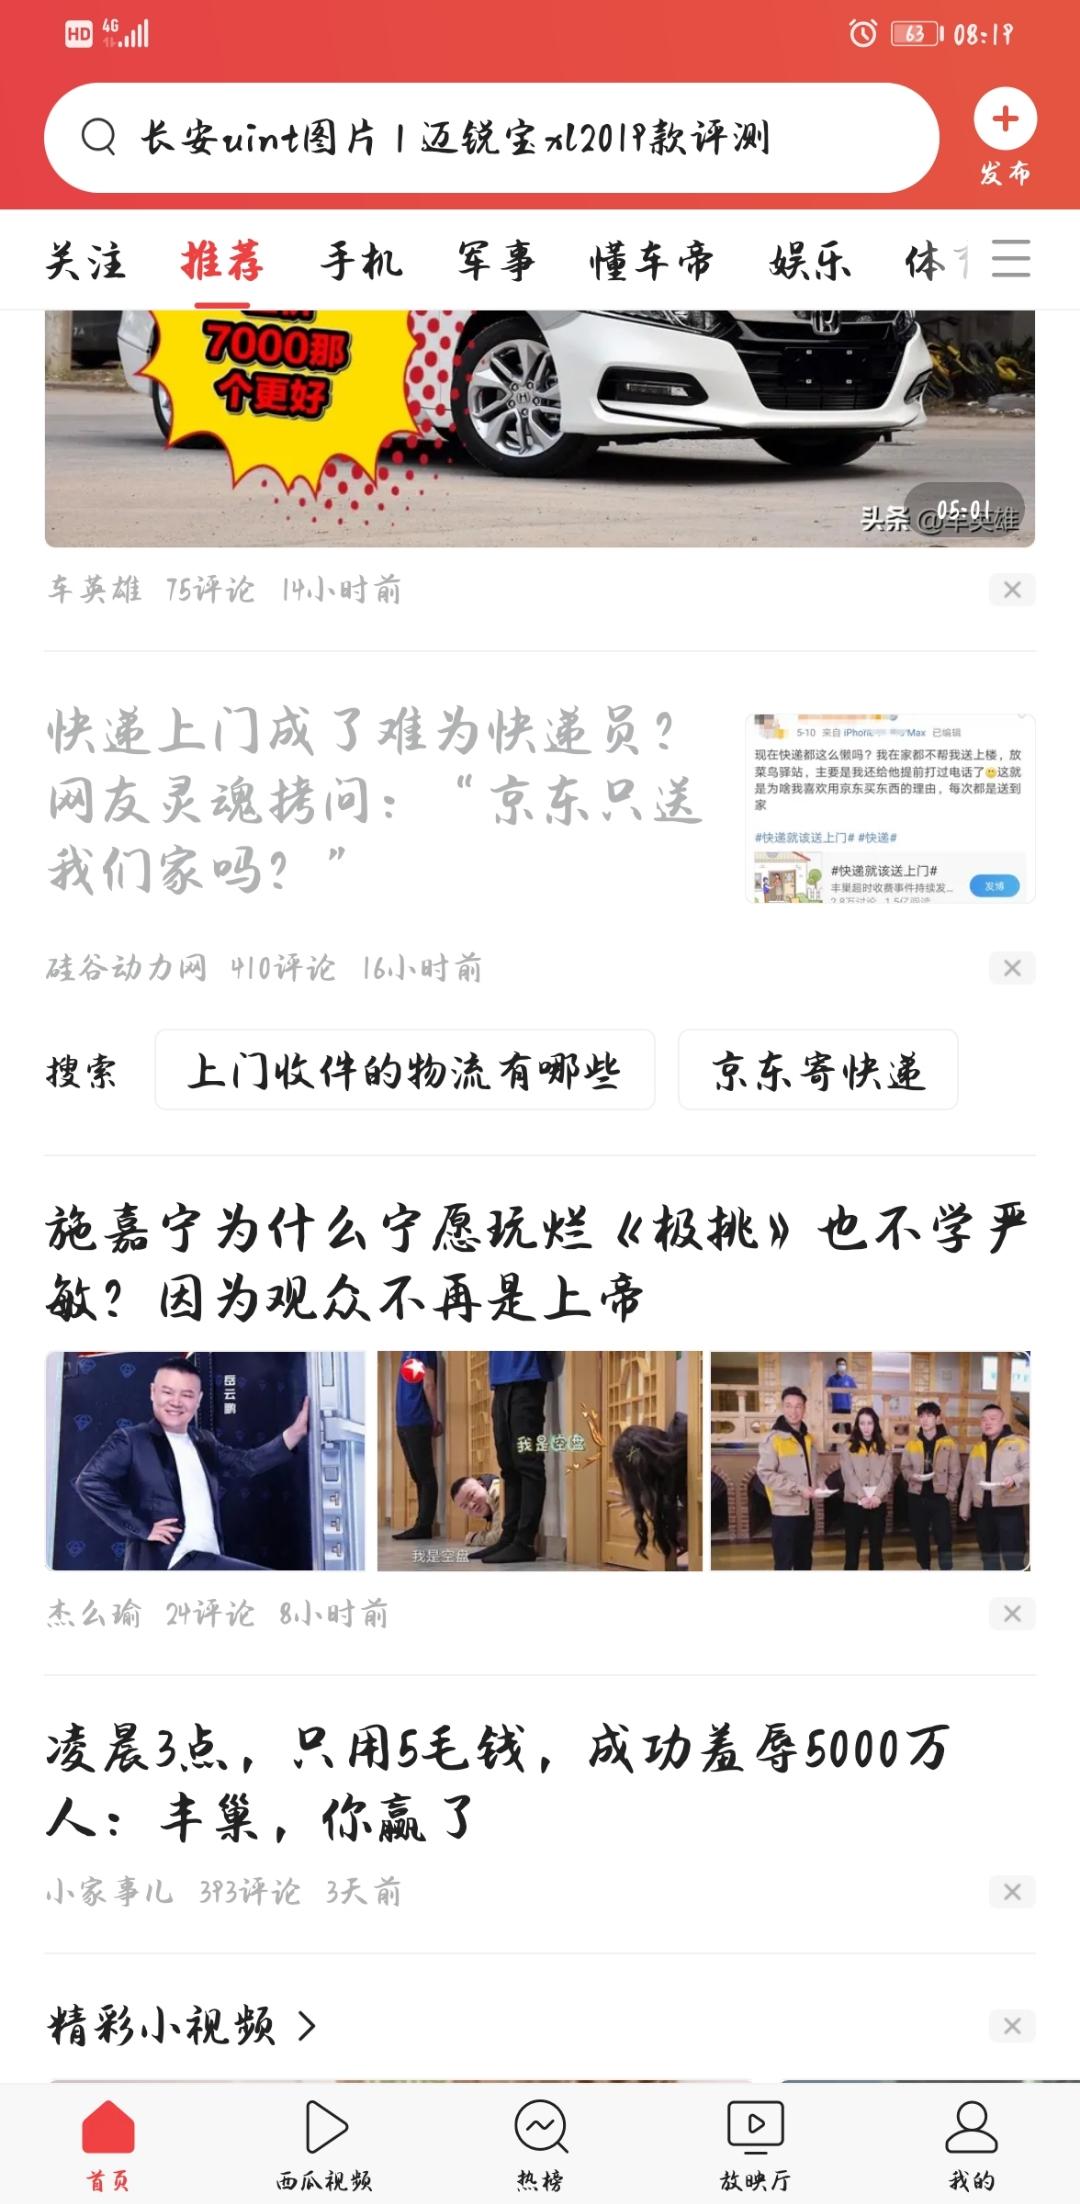 Screenshot_20200516_081955_com.ss.android.article.news.jpg